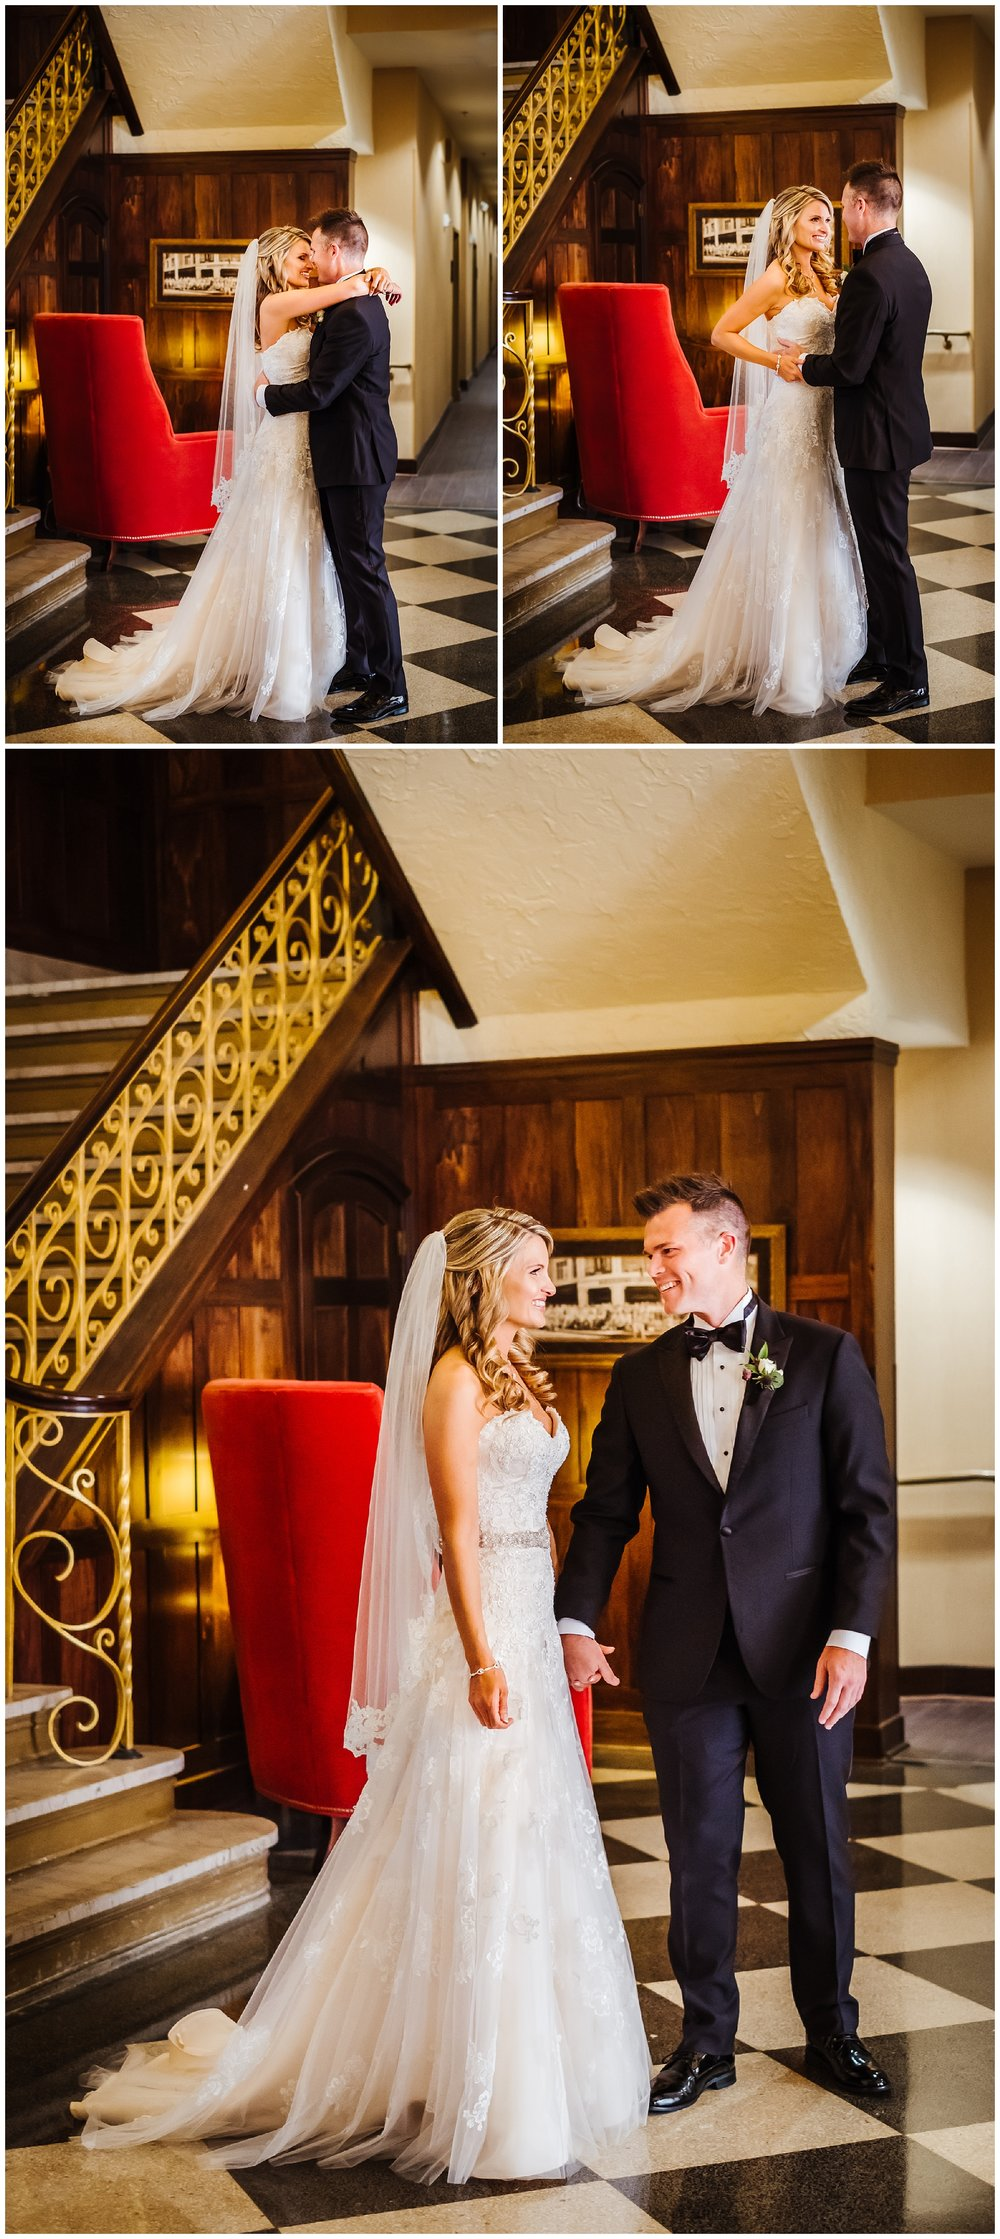 tampa-bradenton-wedding-photographer-south-florida-museum-classic-blush-gold-alpacas-sparklers_0025.jpg